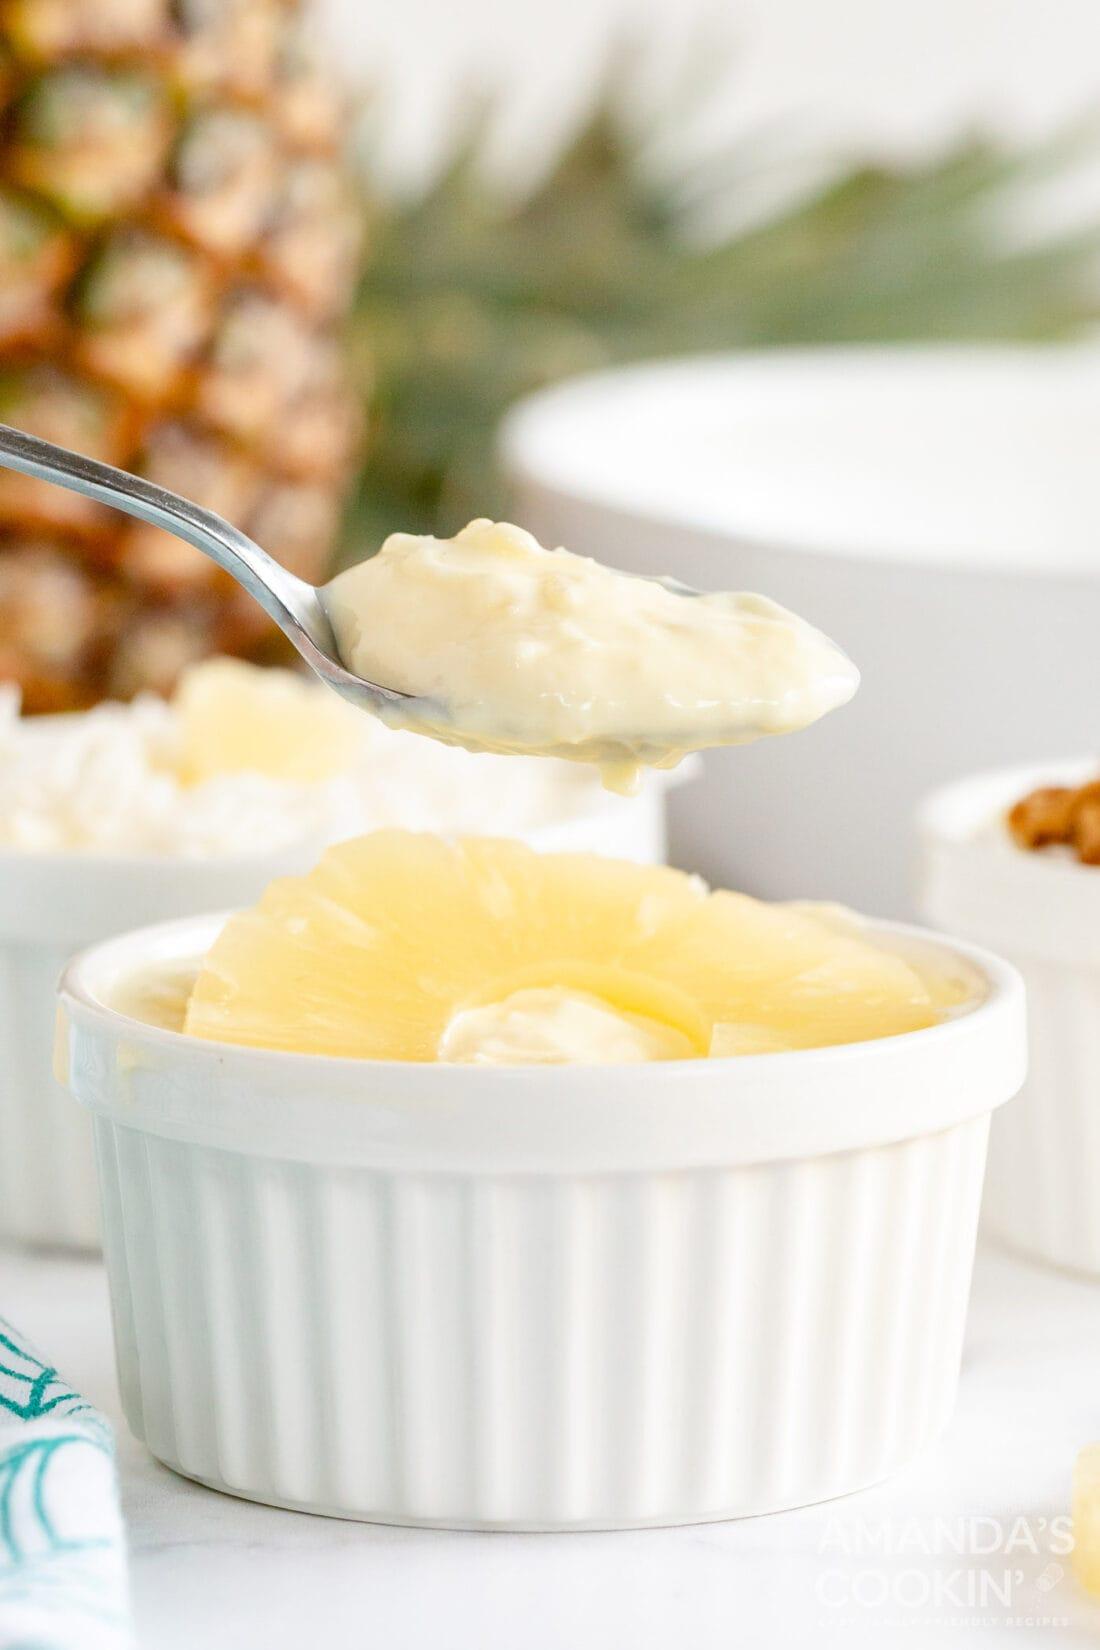 lifting spoon from pineapple yogurt dessert